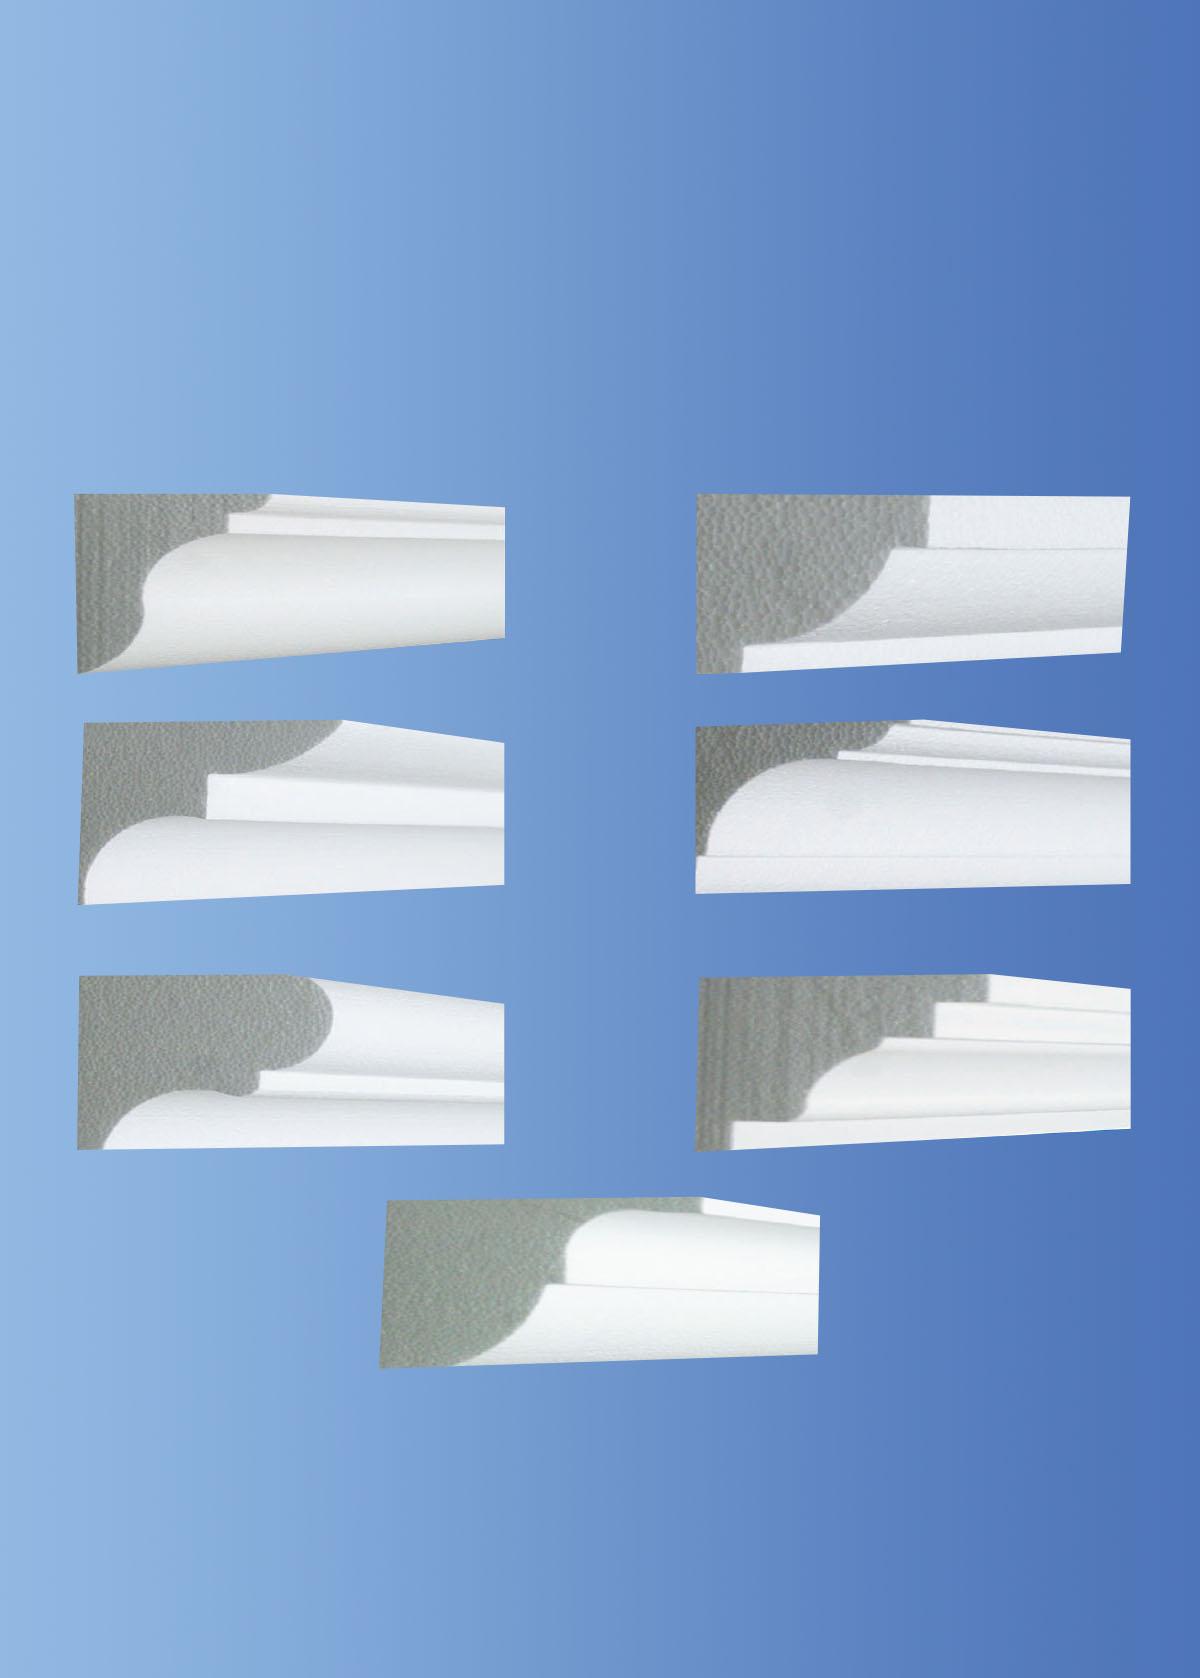 Molduras - panelconsa fabrica del sistema constructivo emmedue m2